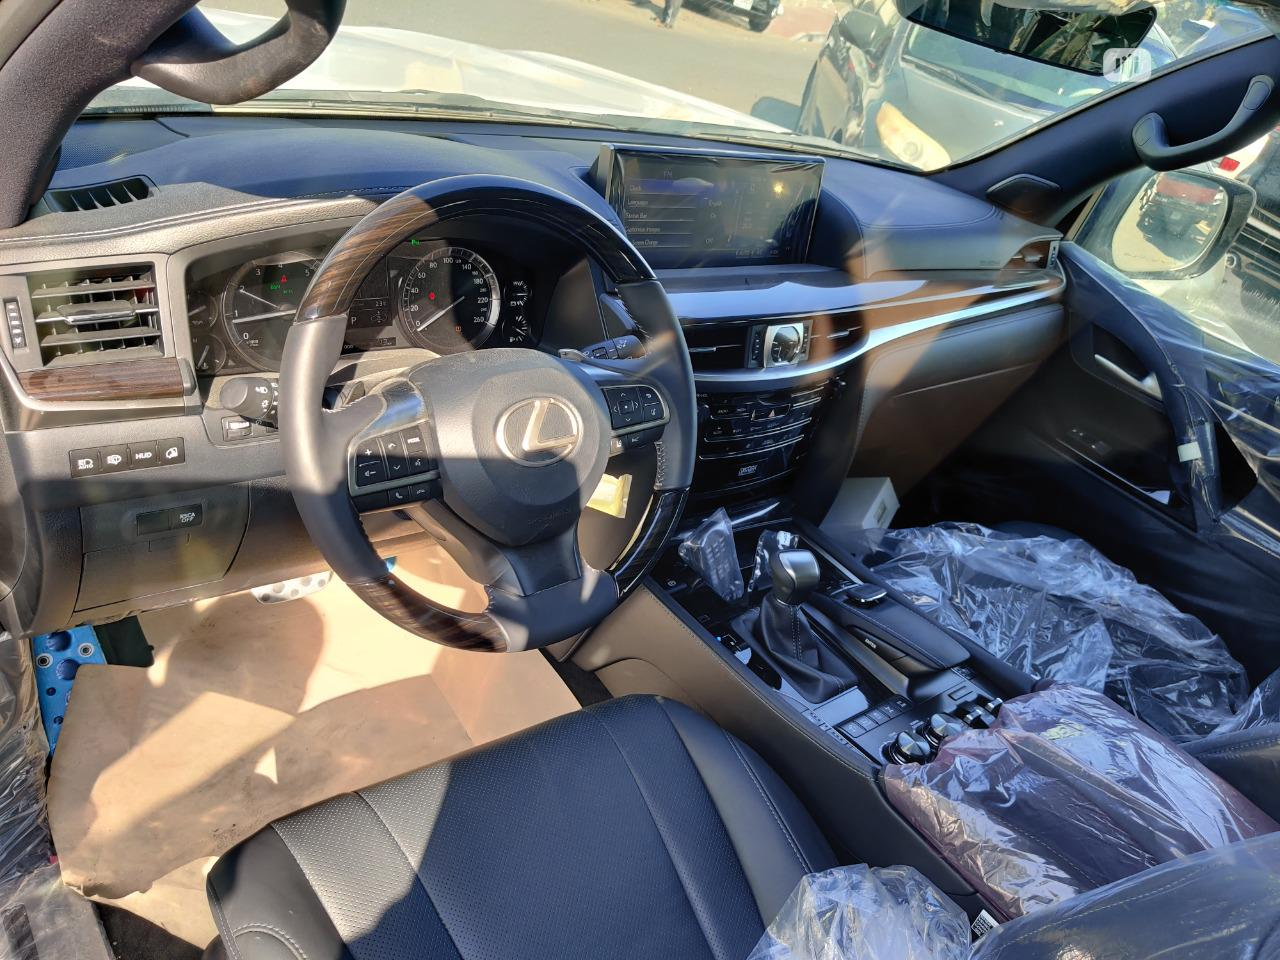 New Lexus LX 2020 570 Three-Row | Cars for sale in Jabi, Abuja (FCT) State, Nigeria